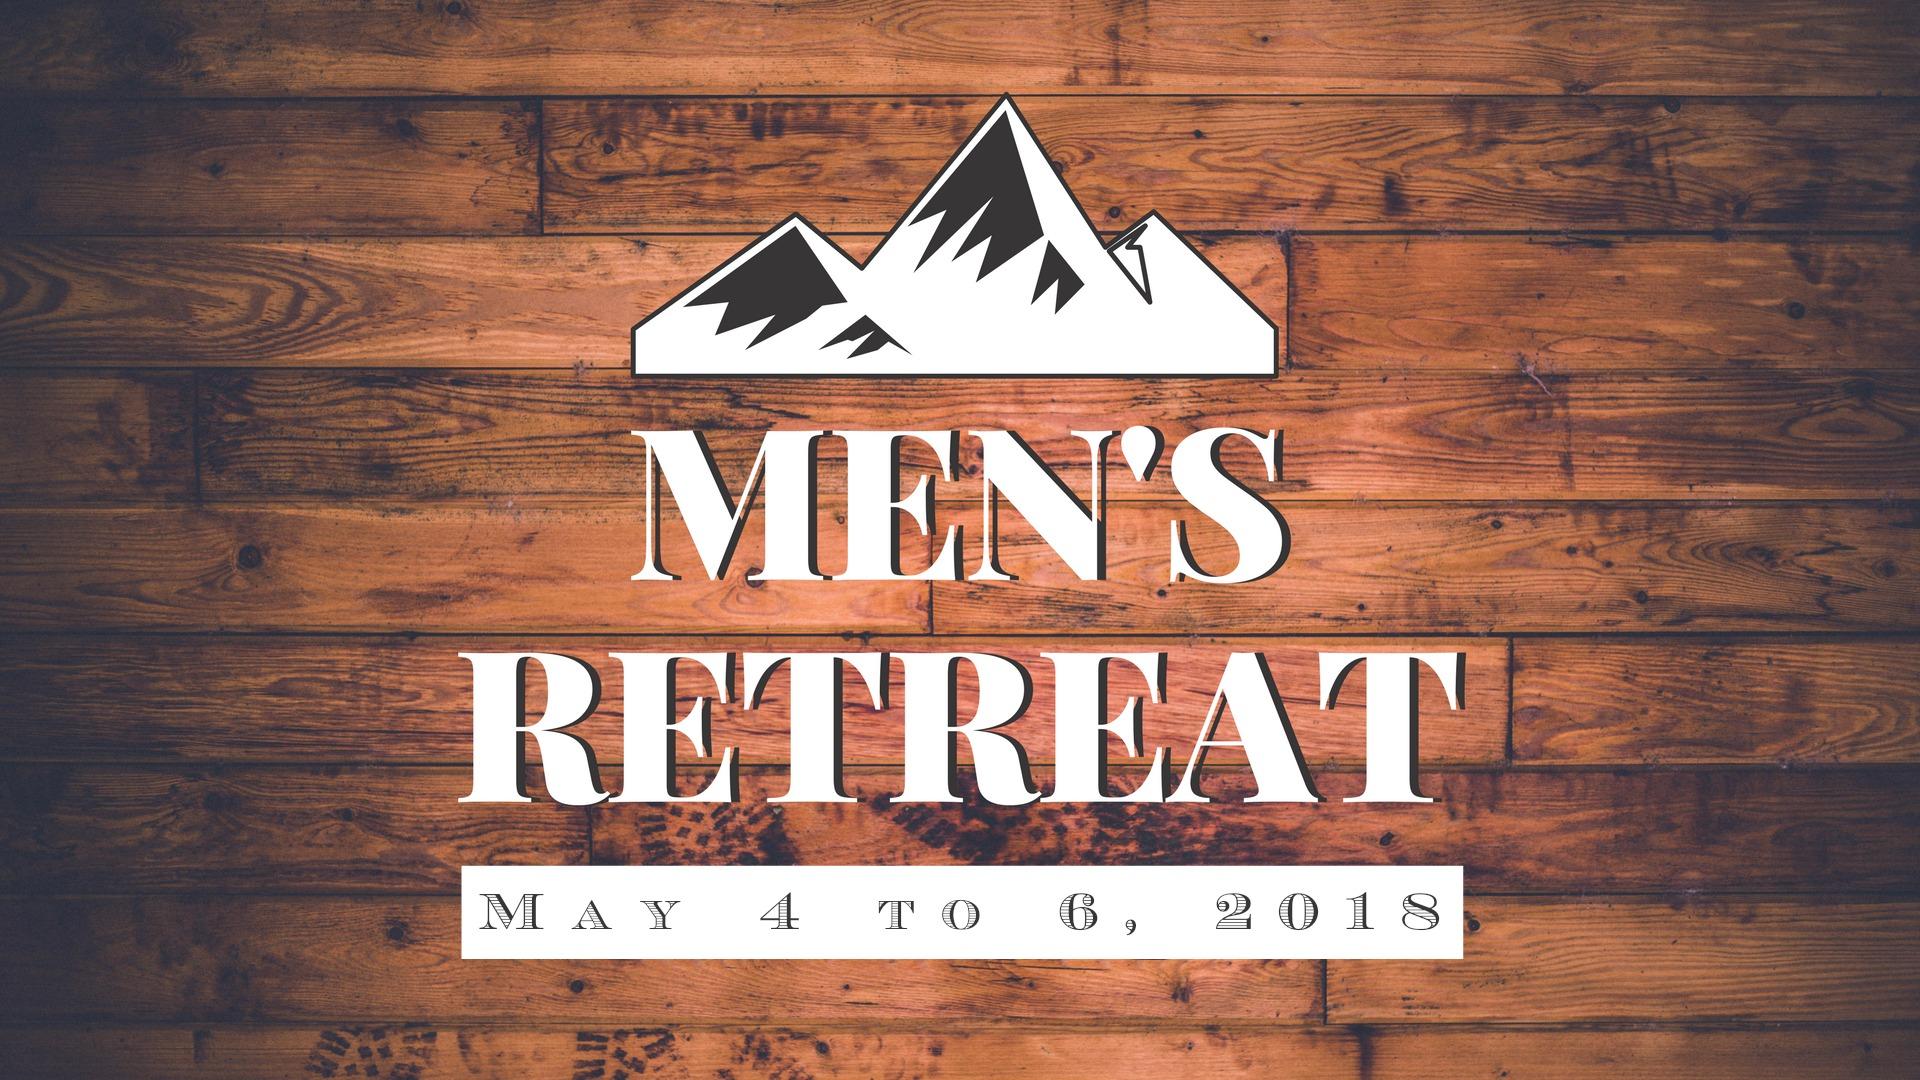 Men s retreat